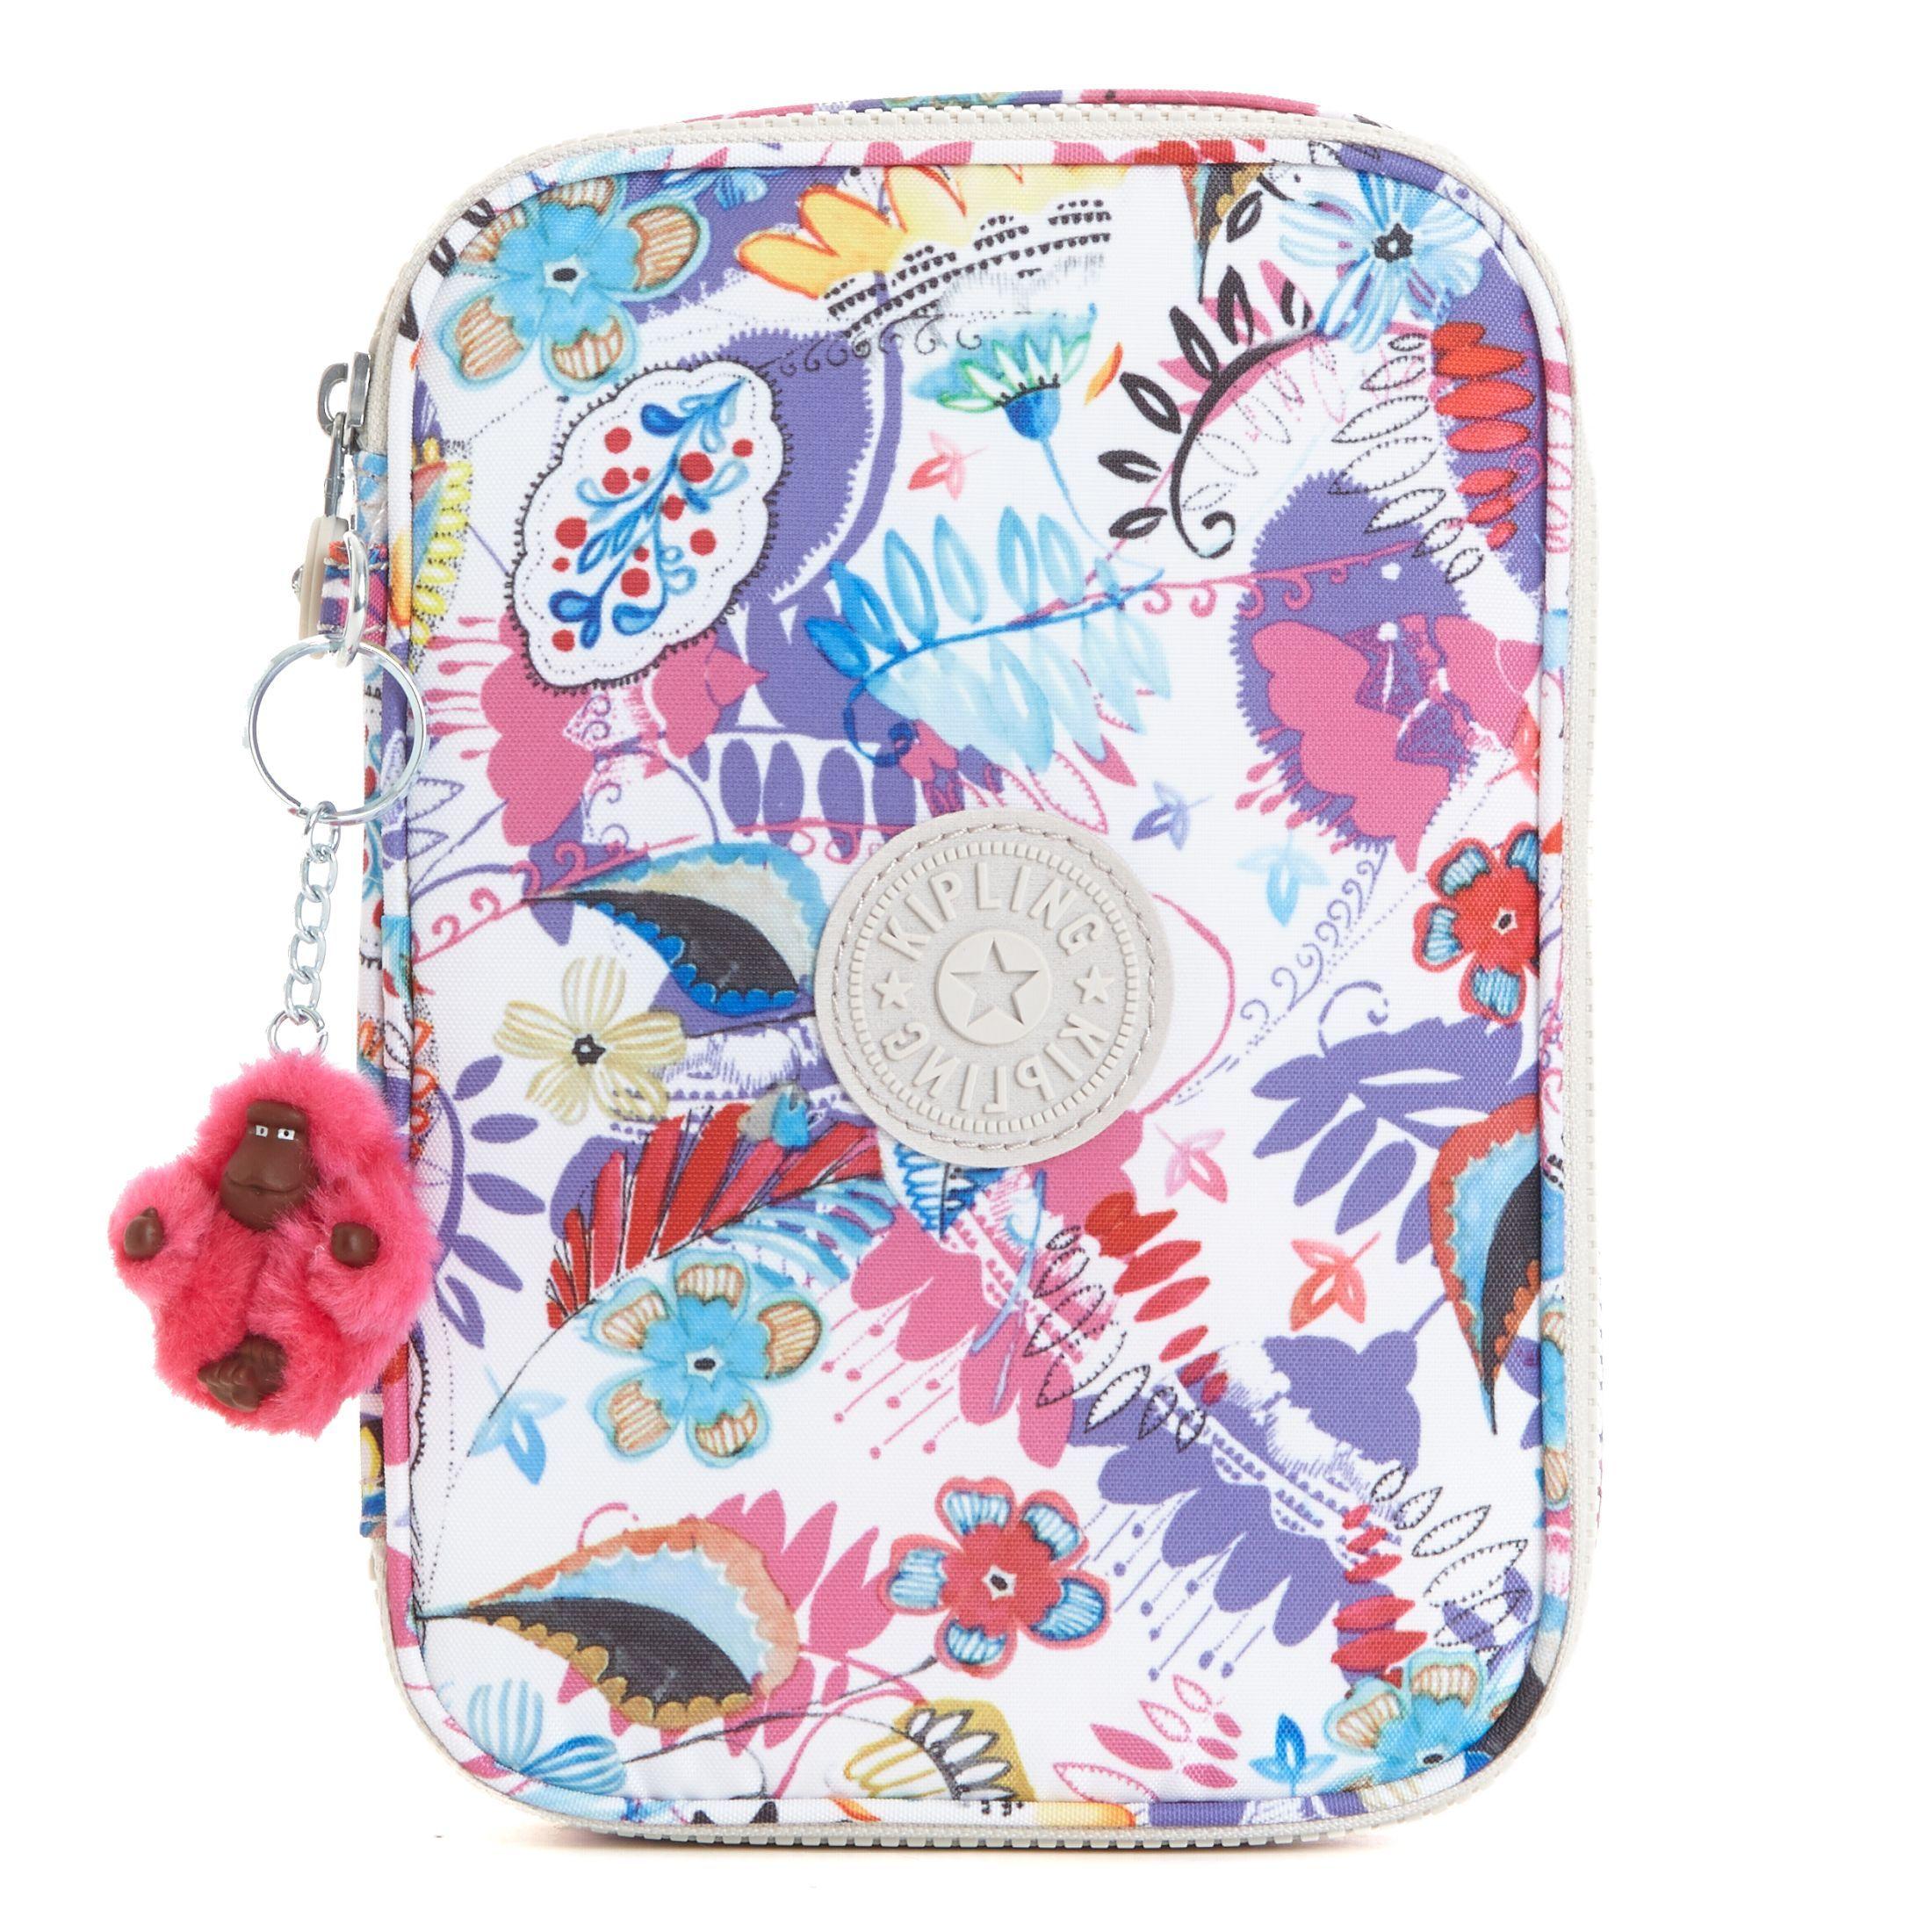 e36f8e5ef 100 Pens Printed Case - Whimsy Floral